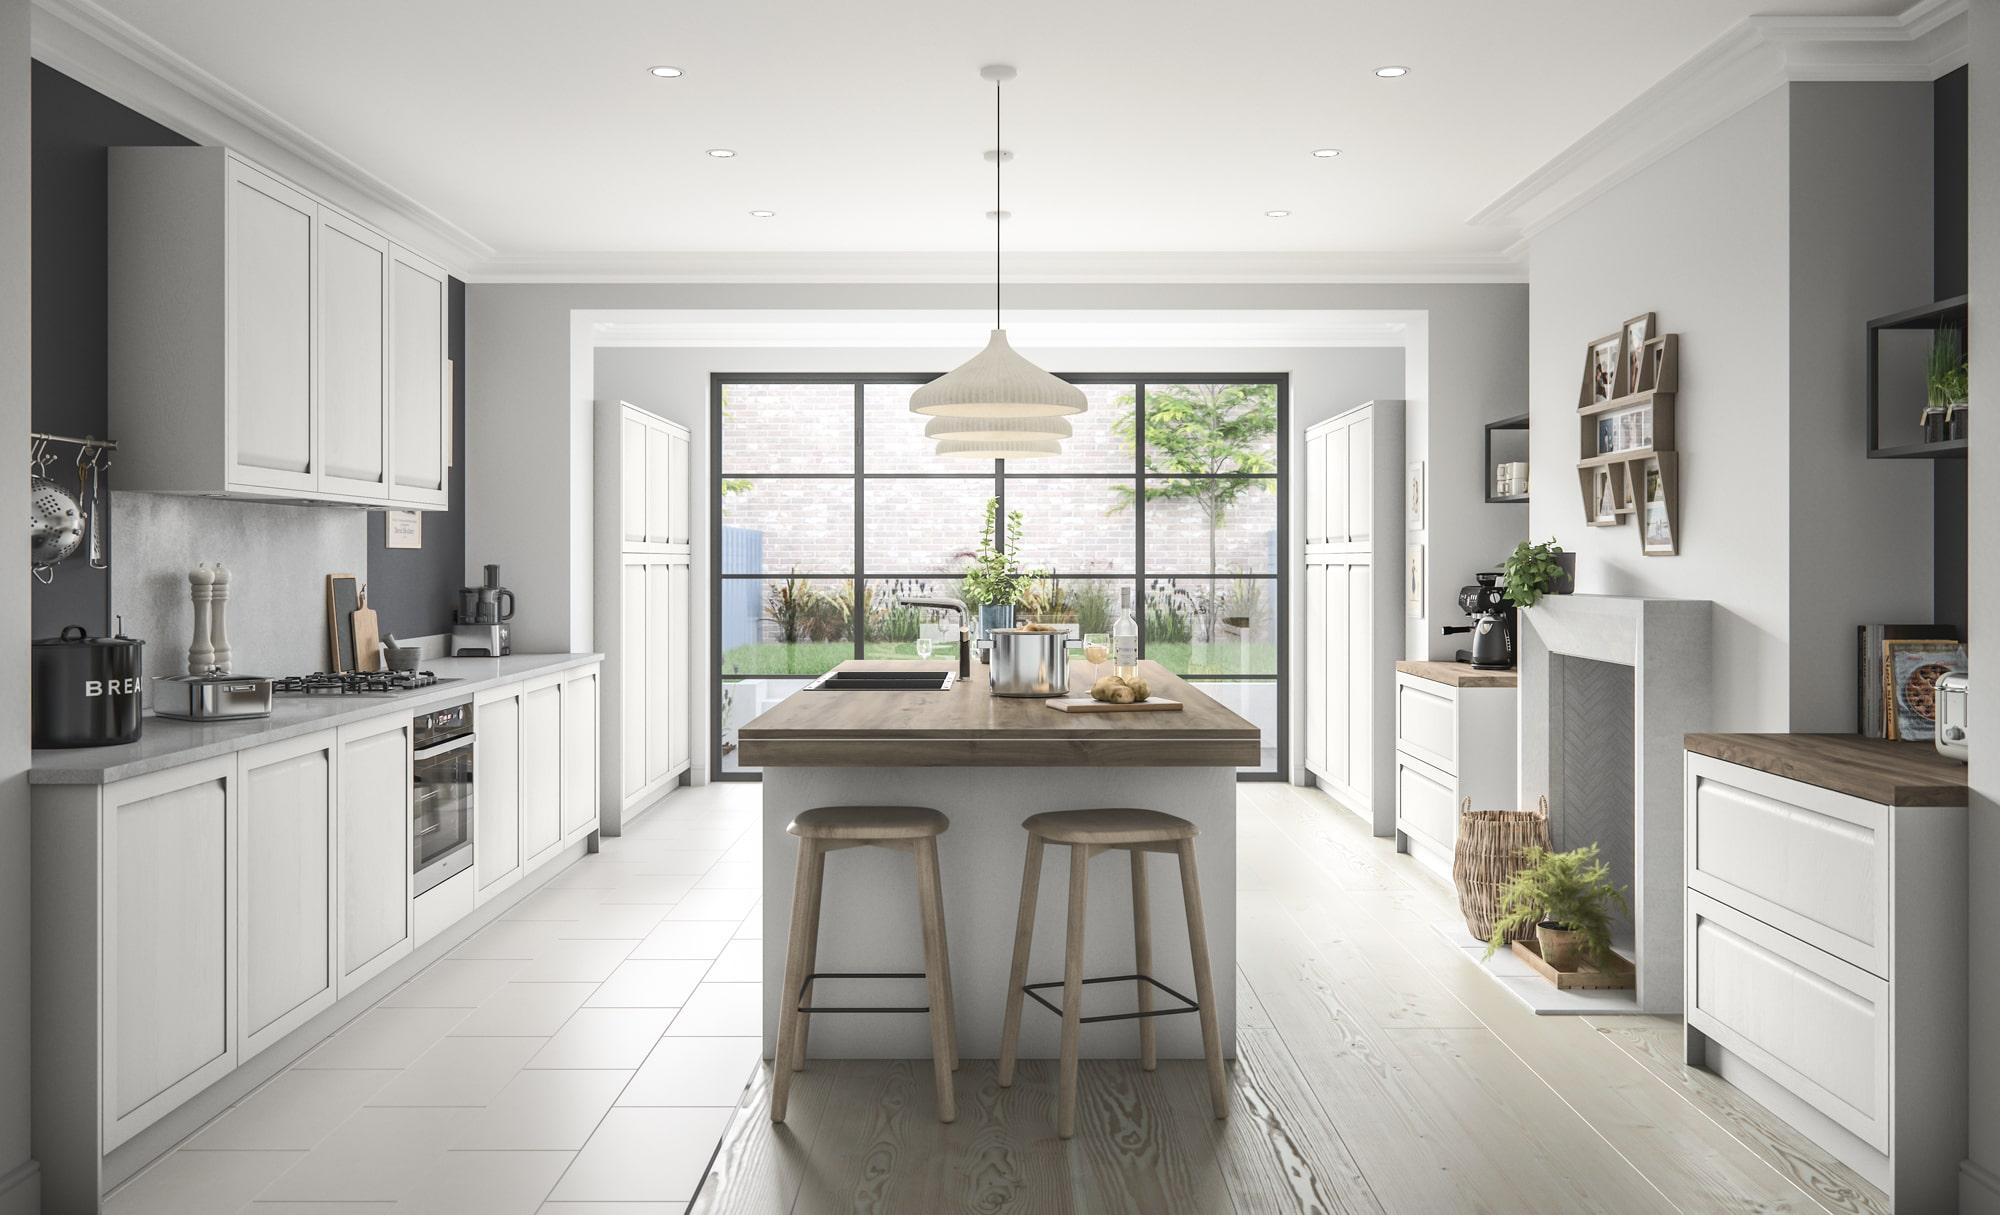 Classic Harborne Kitchen in Light Grey